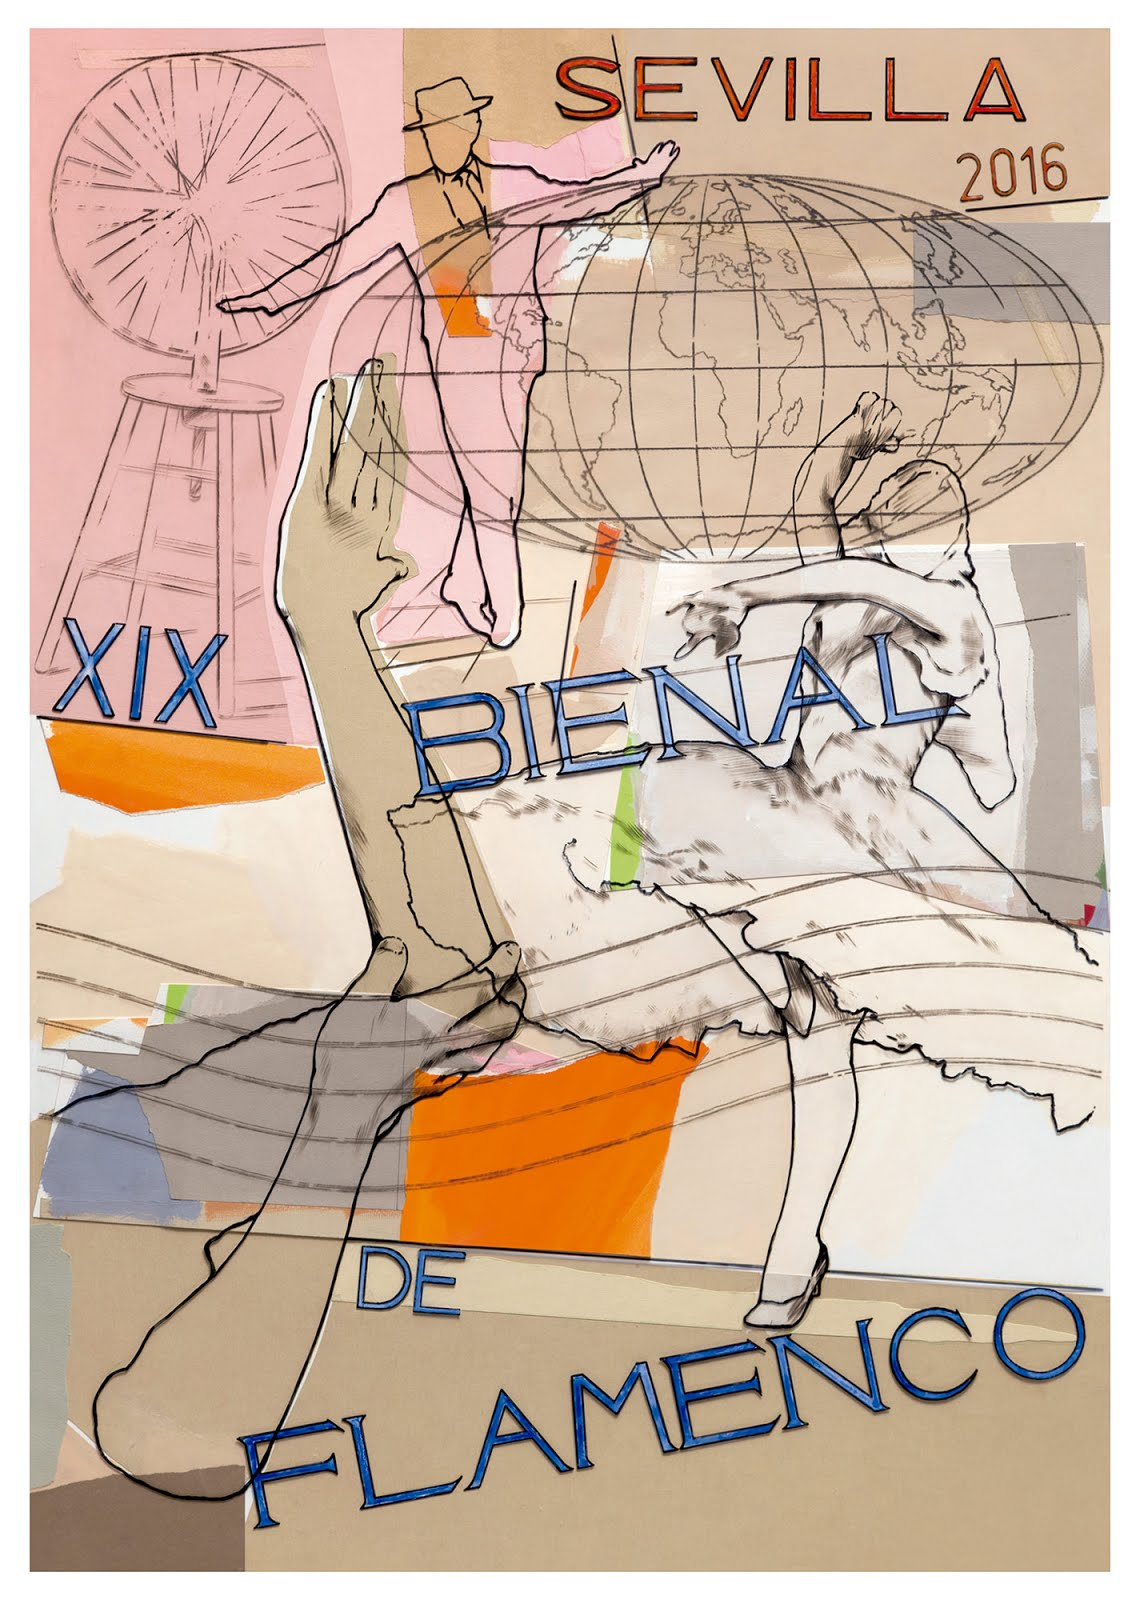 Bienal de Flamenco 2016